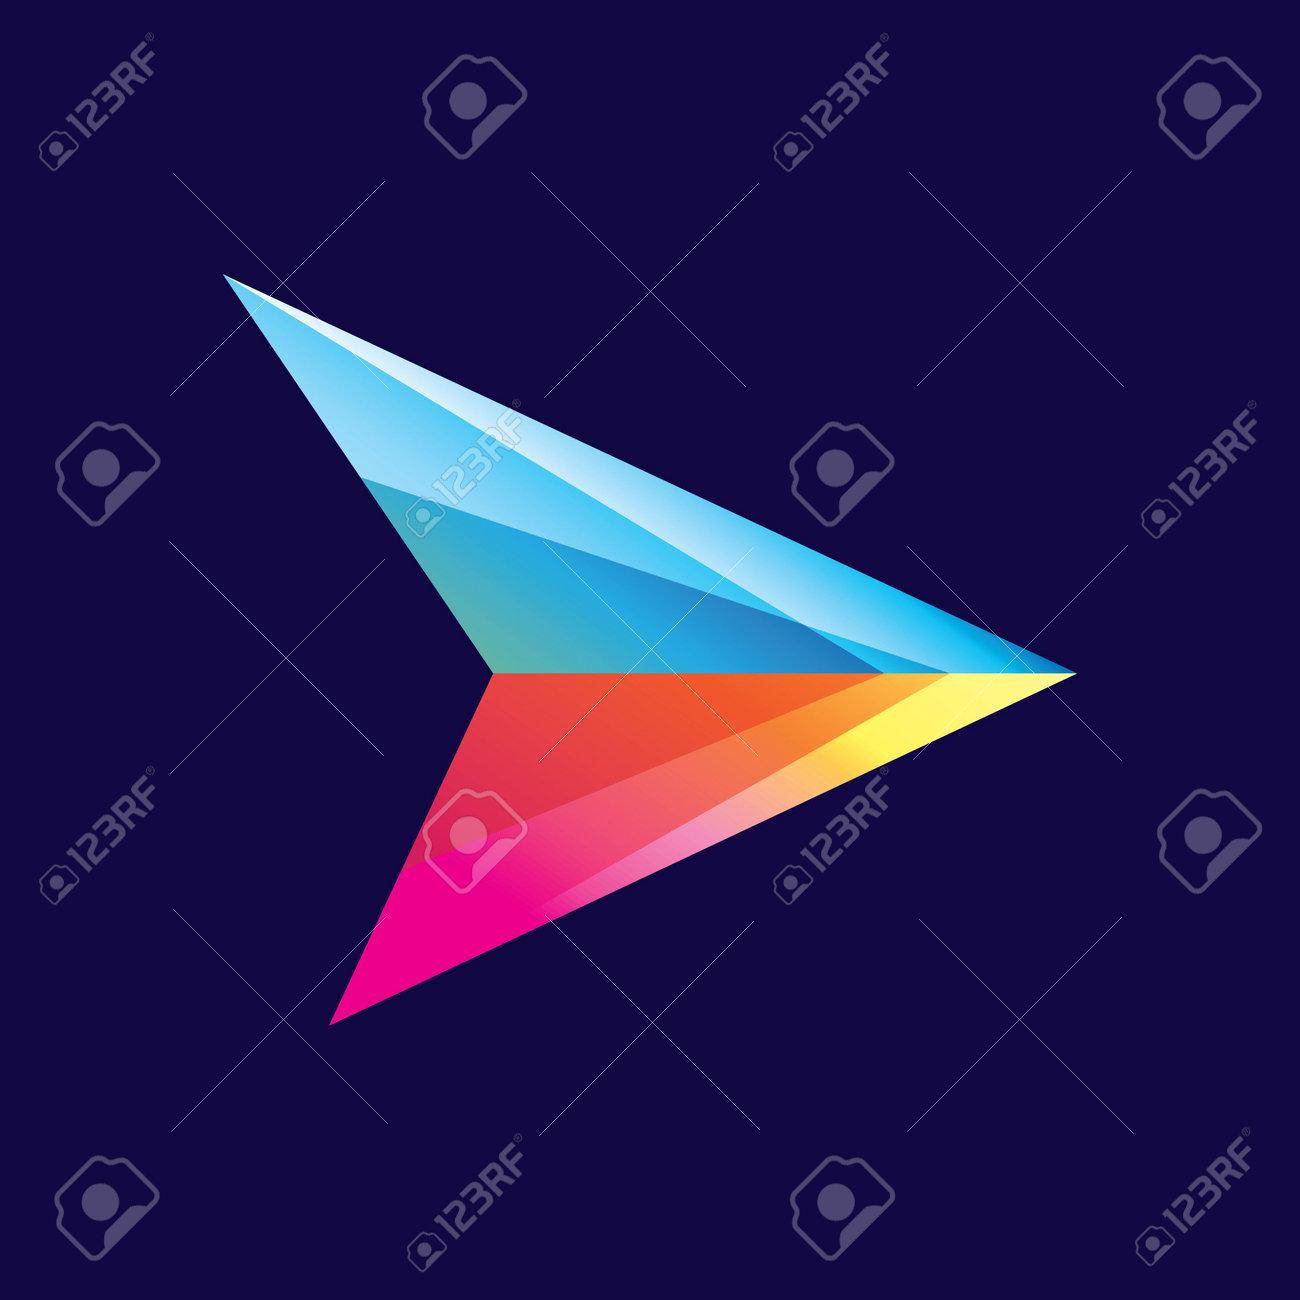 Arrow logo images illustration design - 167448784